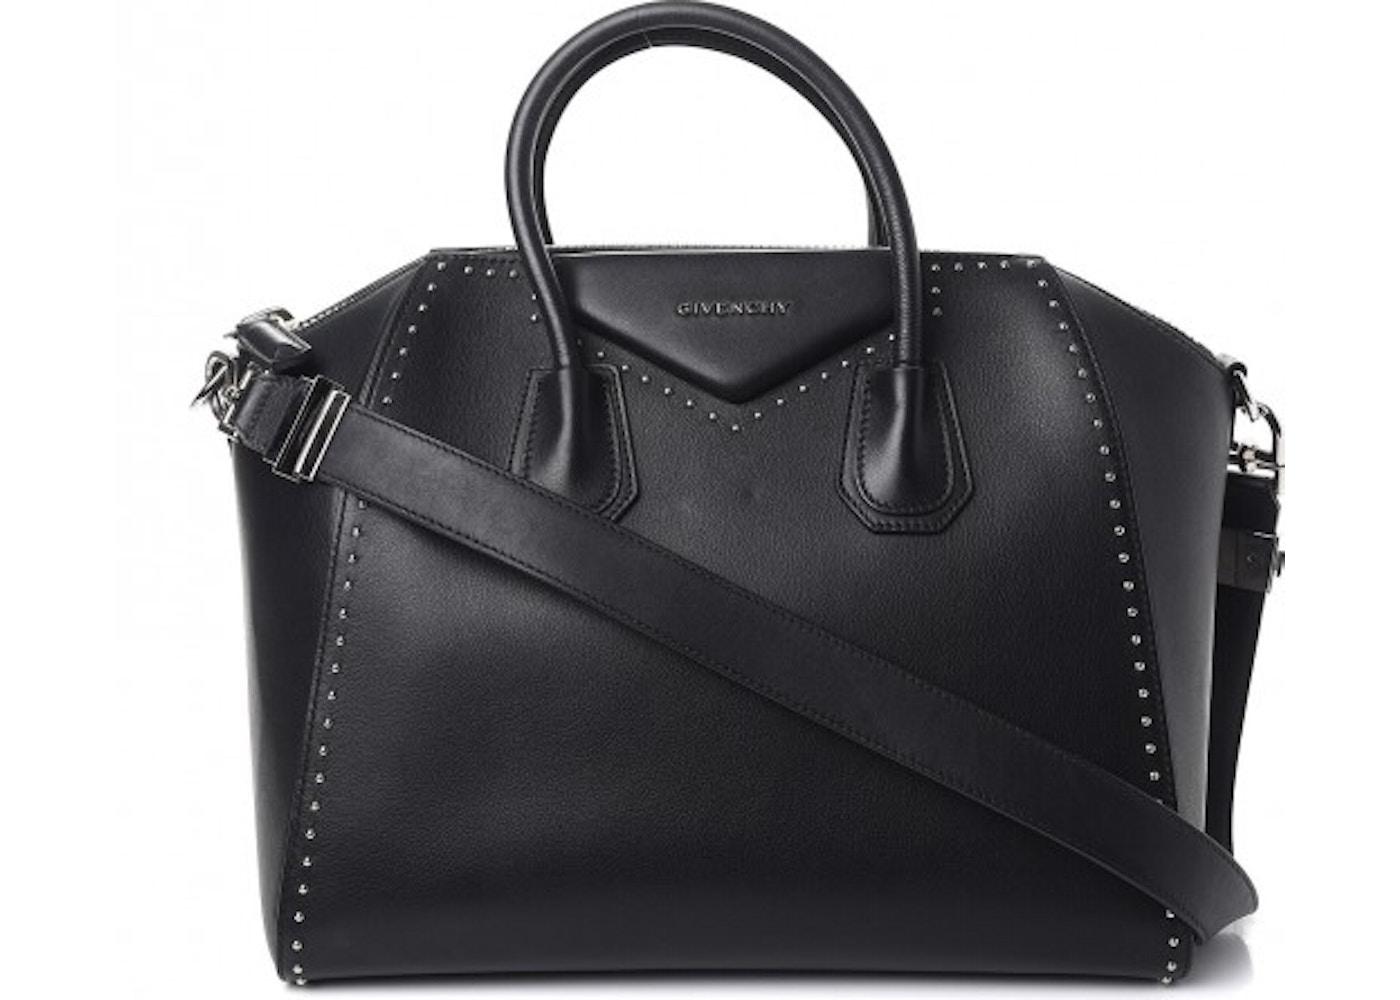 ae35f2d1ae2a Givenchy Antigona Tote Studded Textured Medium Black. Studded Textured  Medium Black